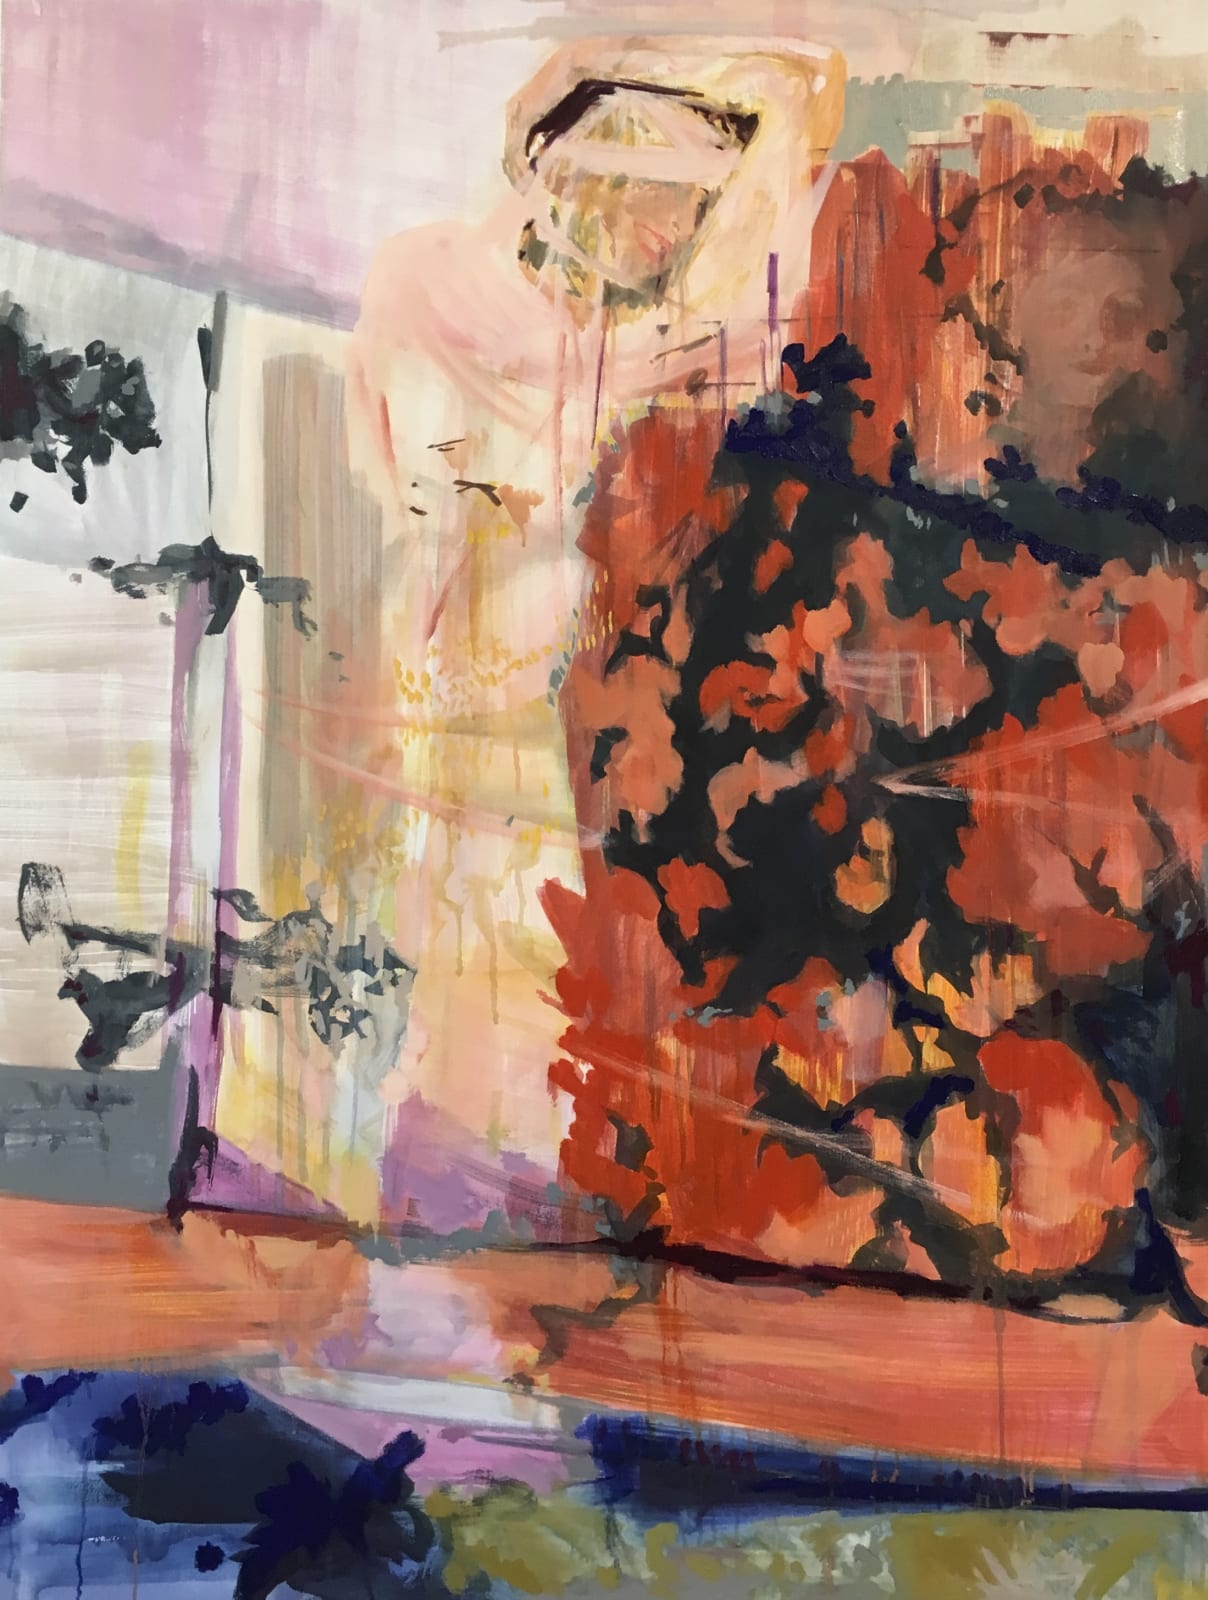 Elizabeth Schwaiger, Wrapping Up, 2017